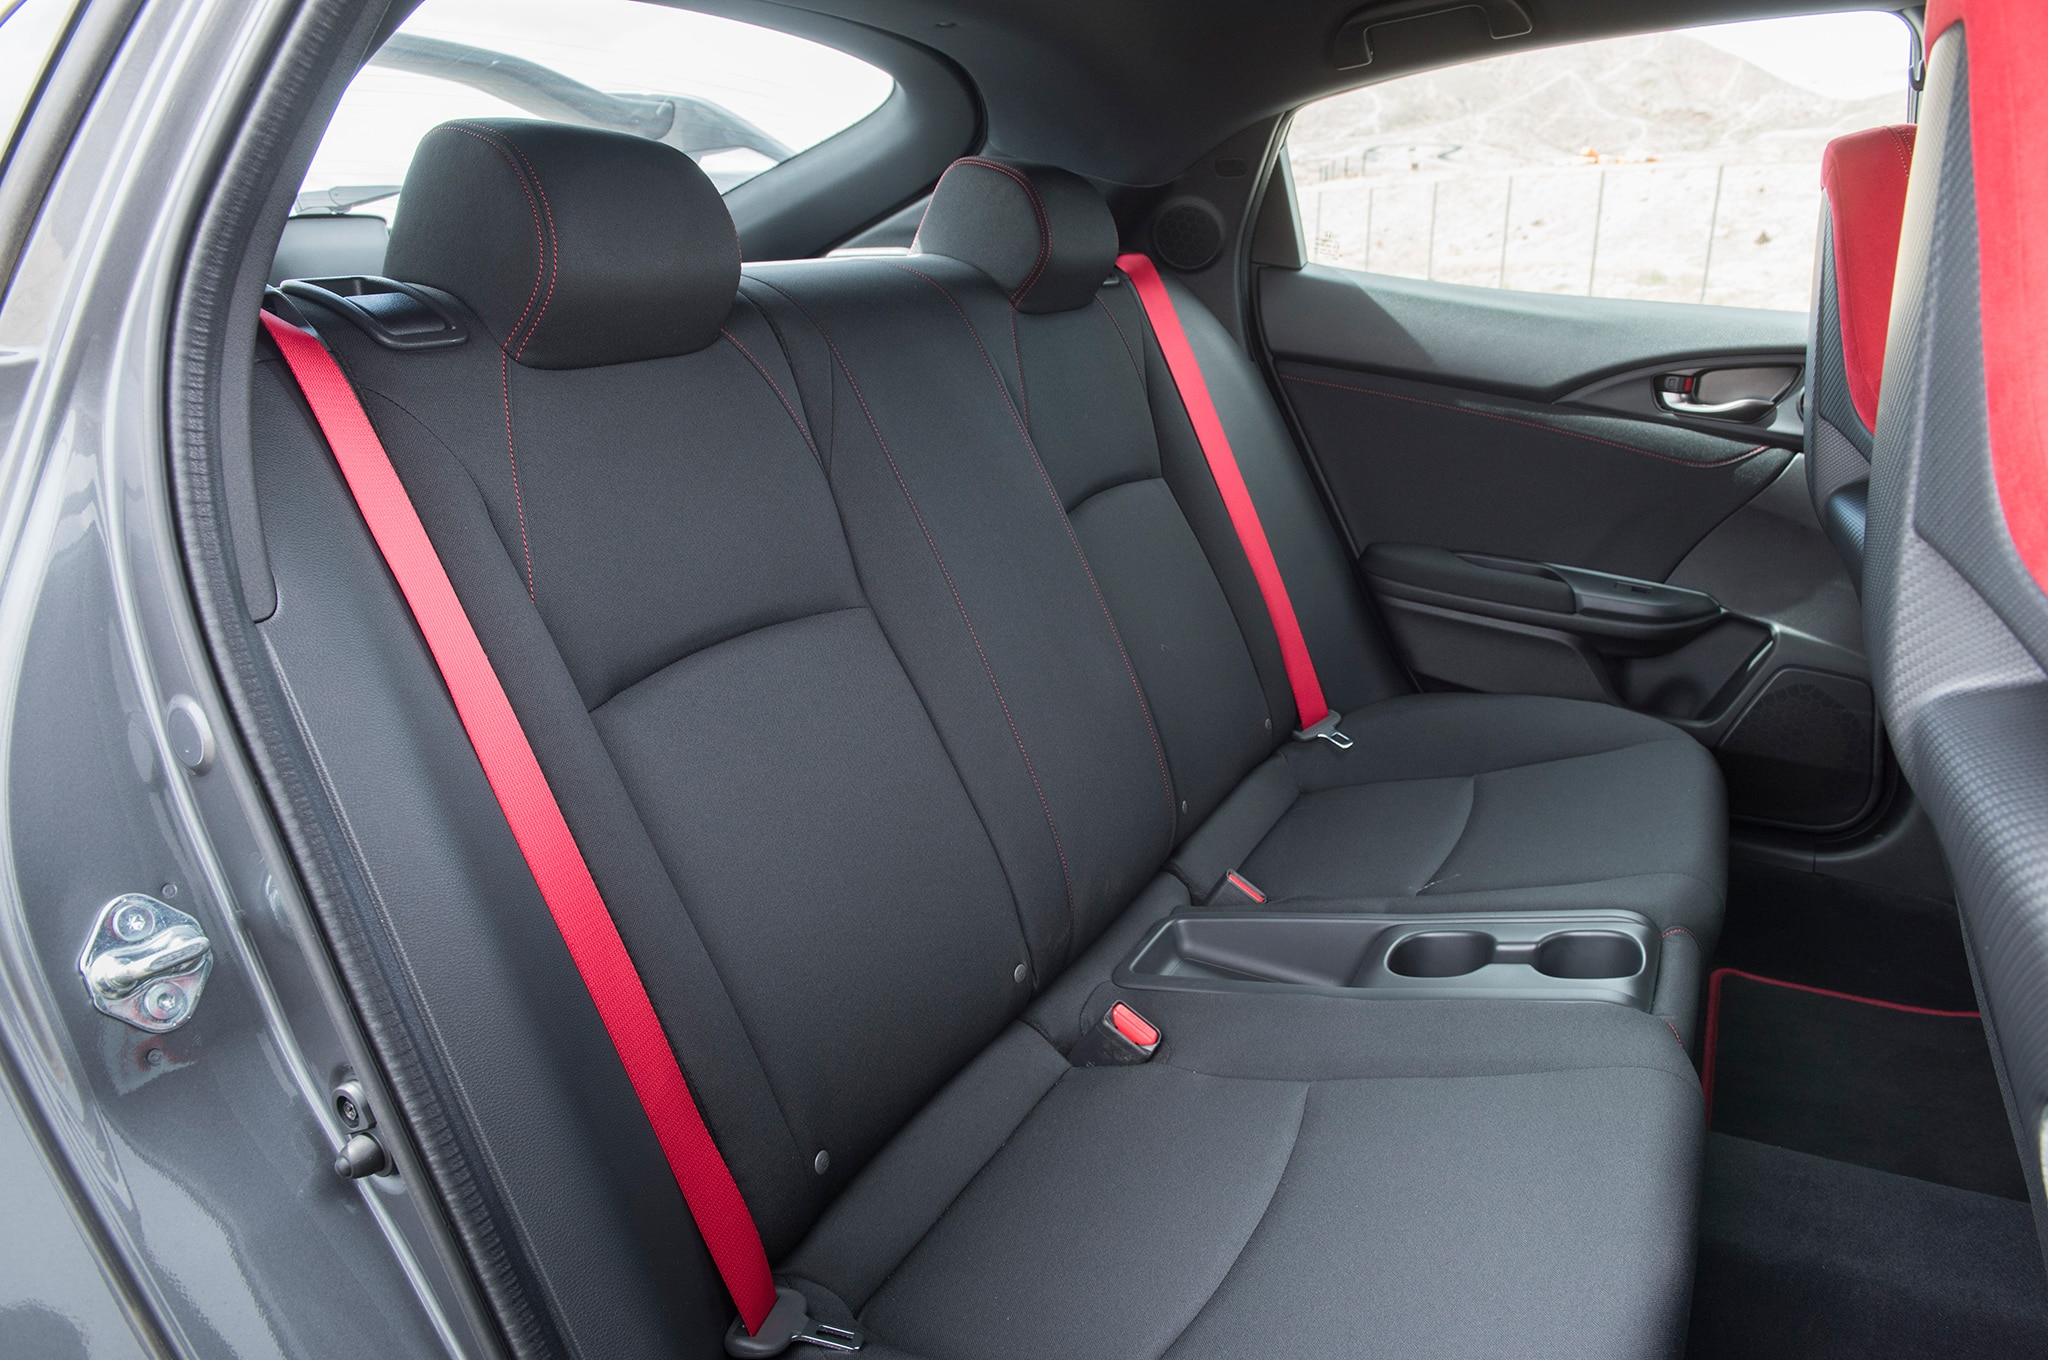 2018 Honda Civic Type R Interior Rear Seats Motor Trend